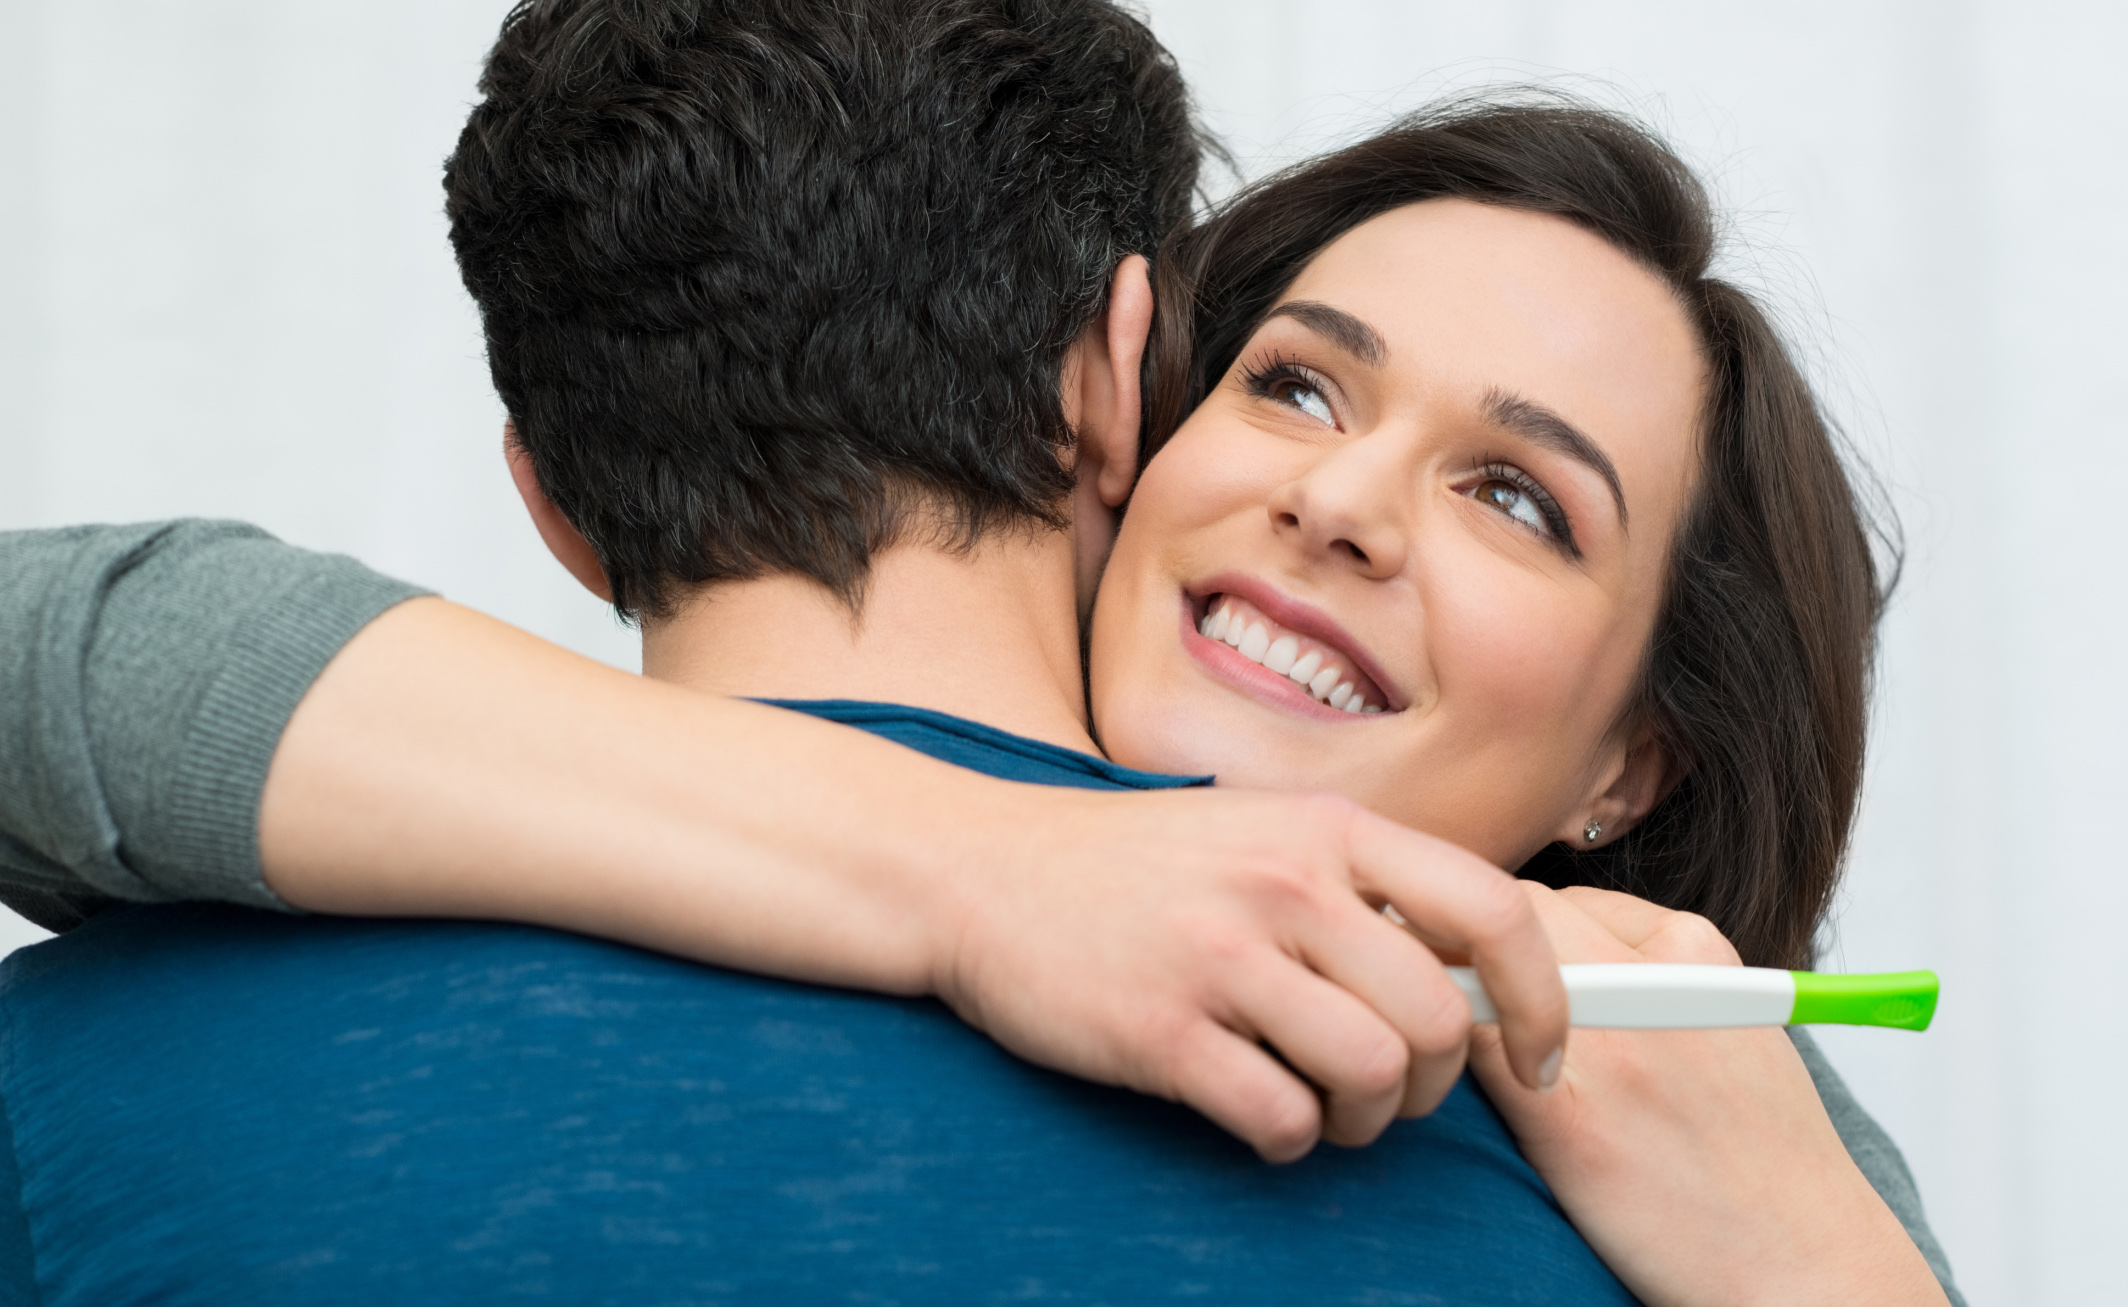 Fertilità: le false convinzioni registrate dai medici